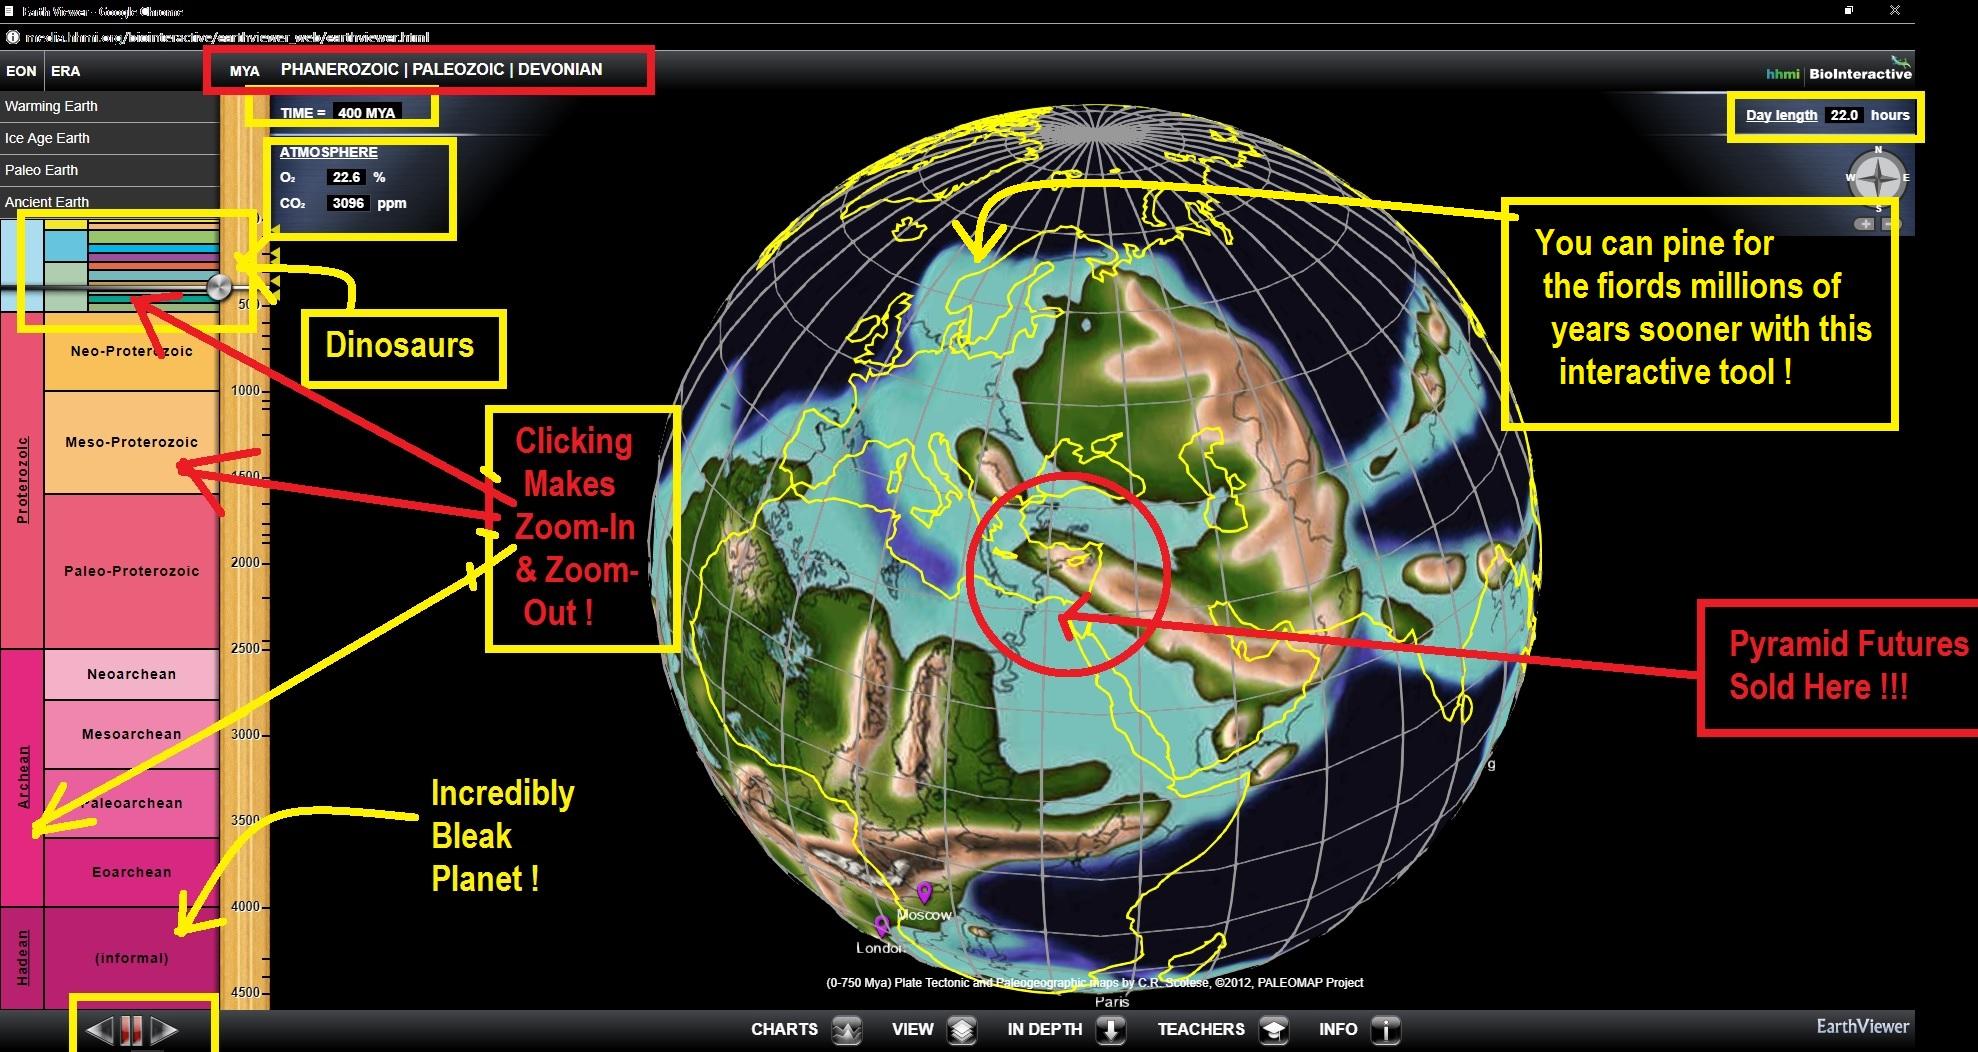 interactive earthjpg1978x1052 553 kb